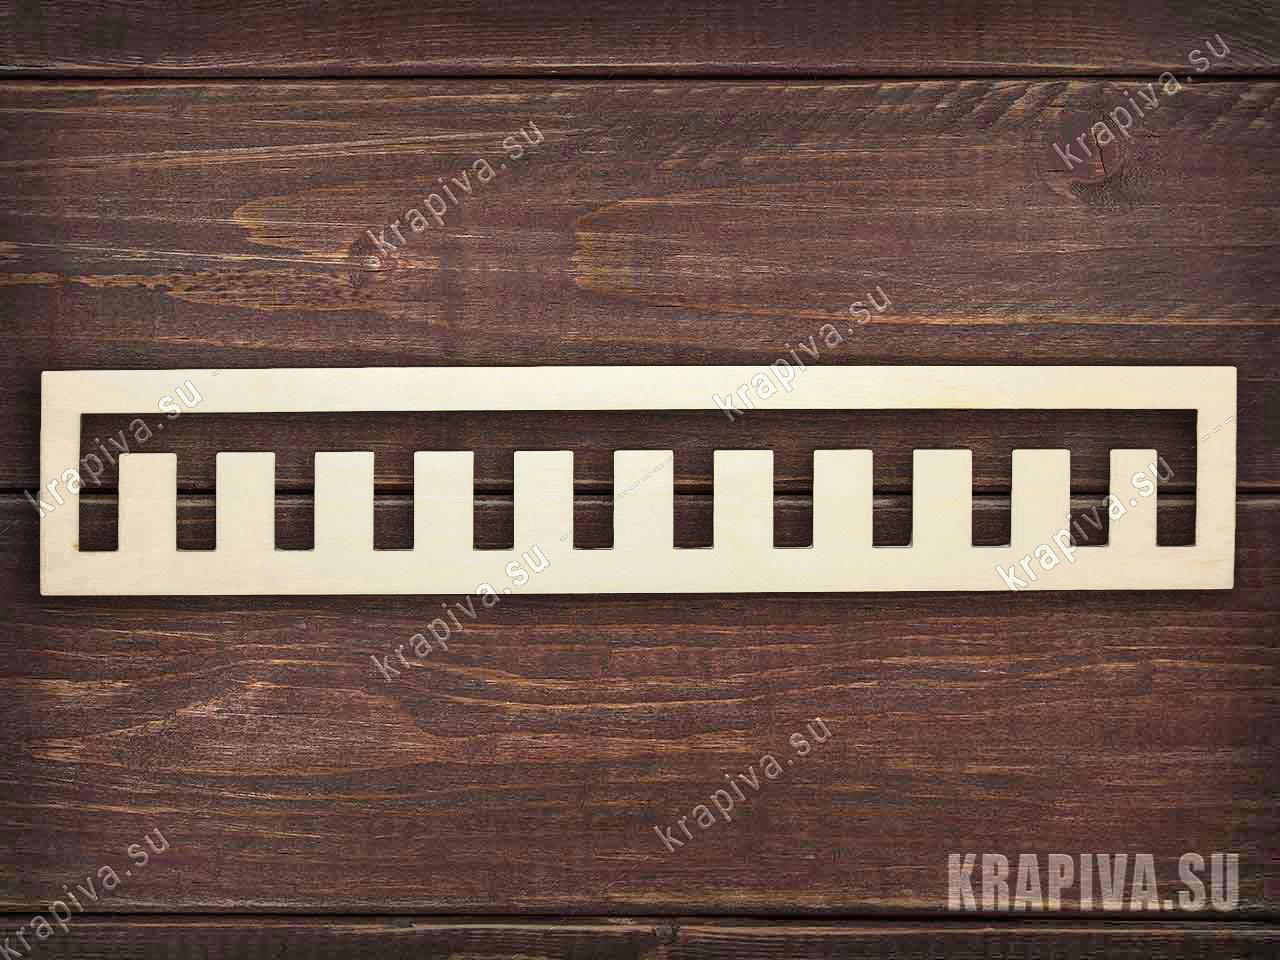 Развивающая линейка №5 за 46 руб. в магазине Крапива (krapiva.su) (фото)